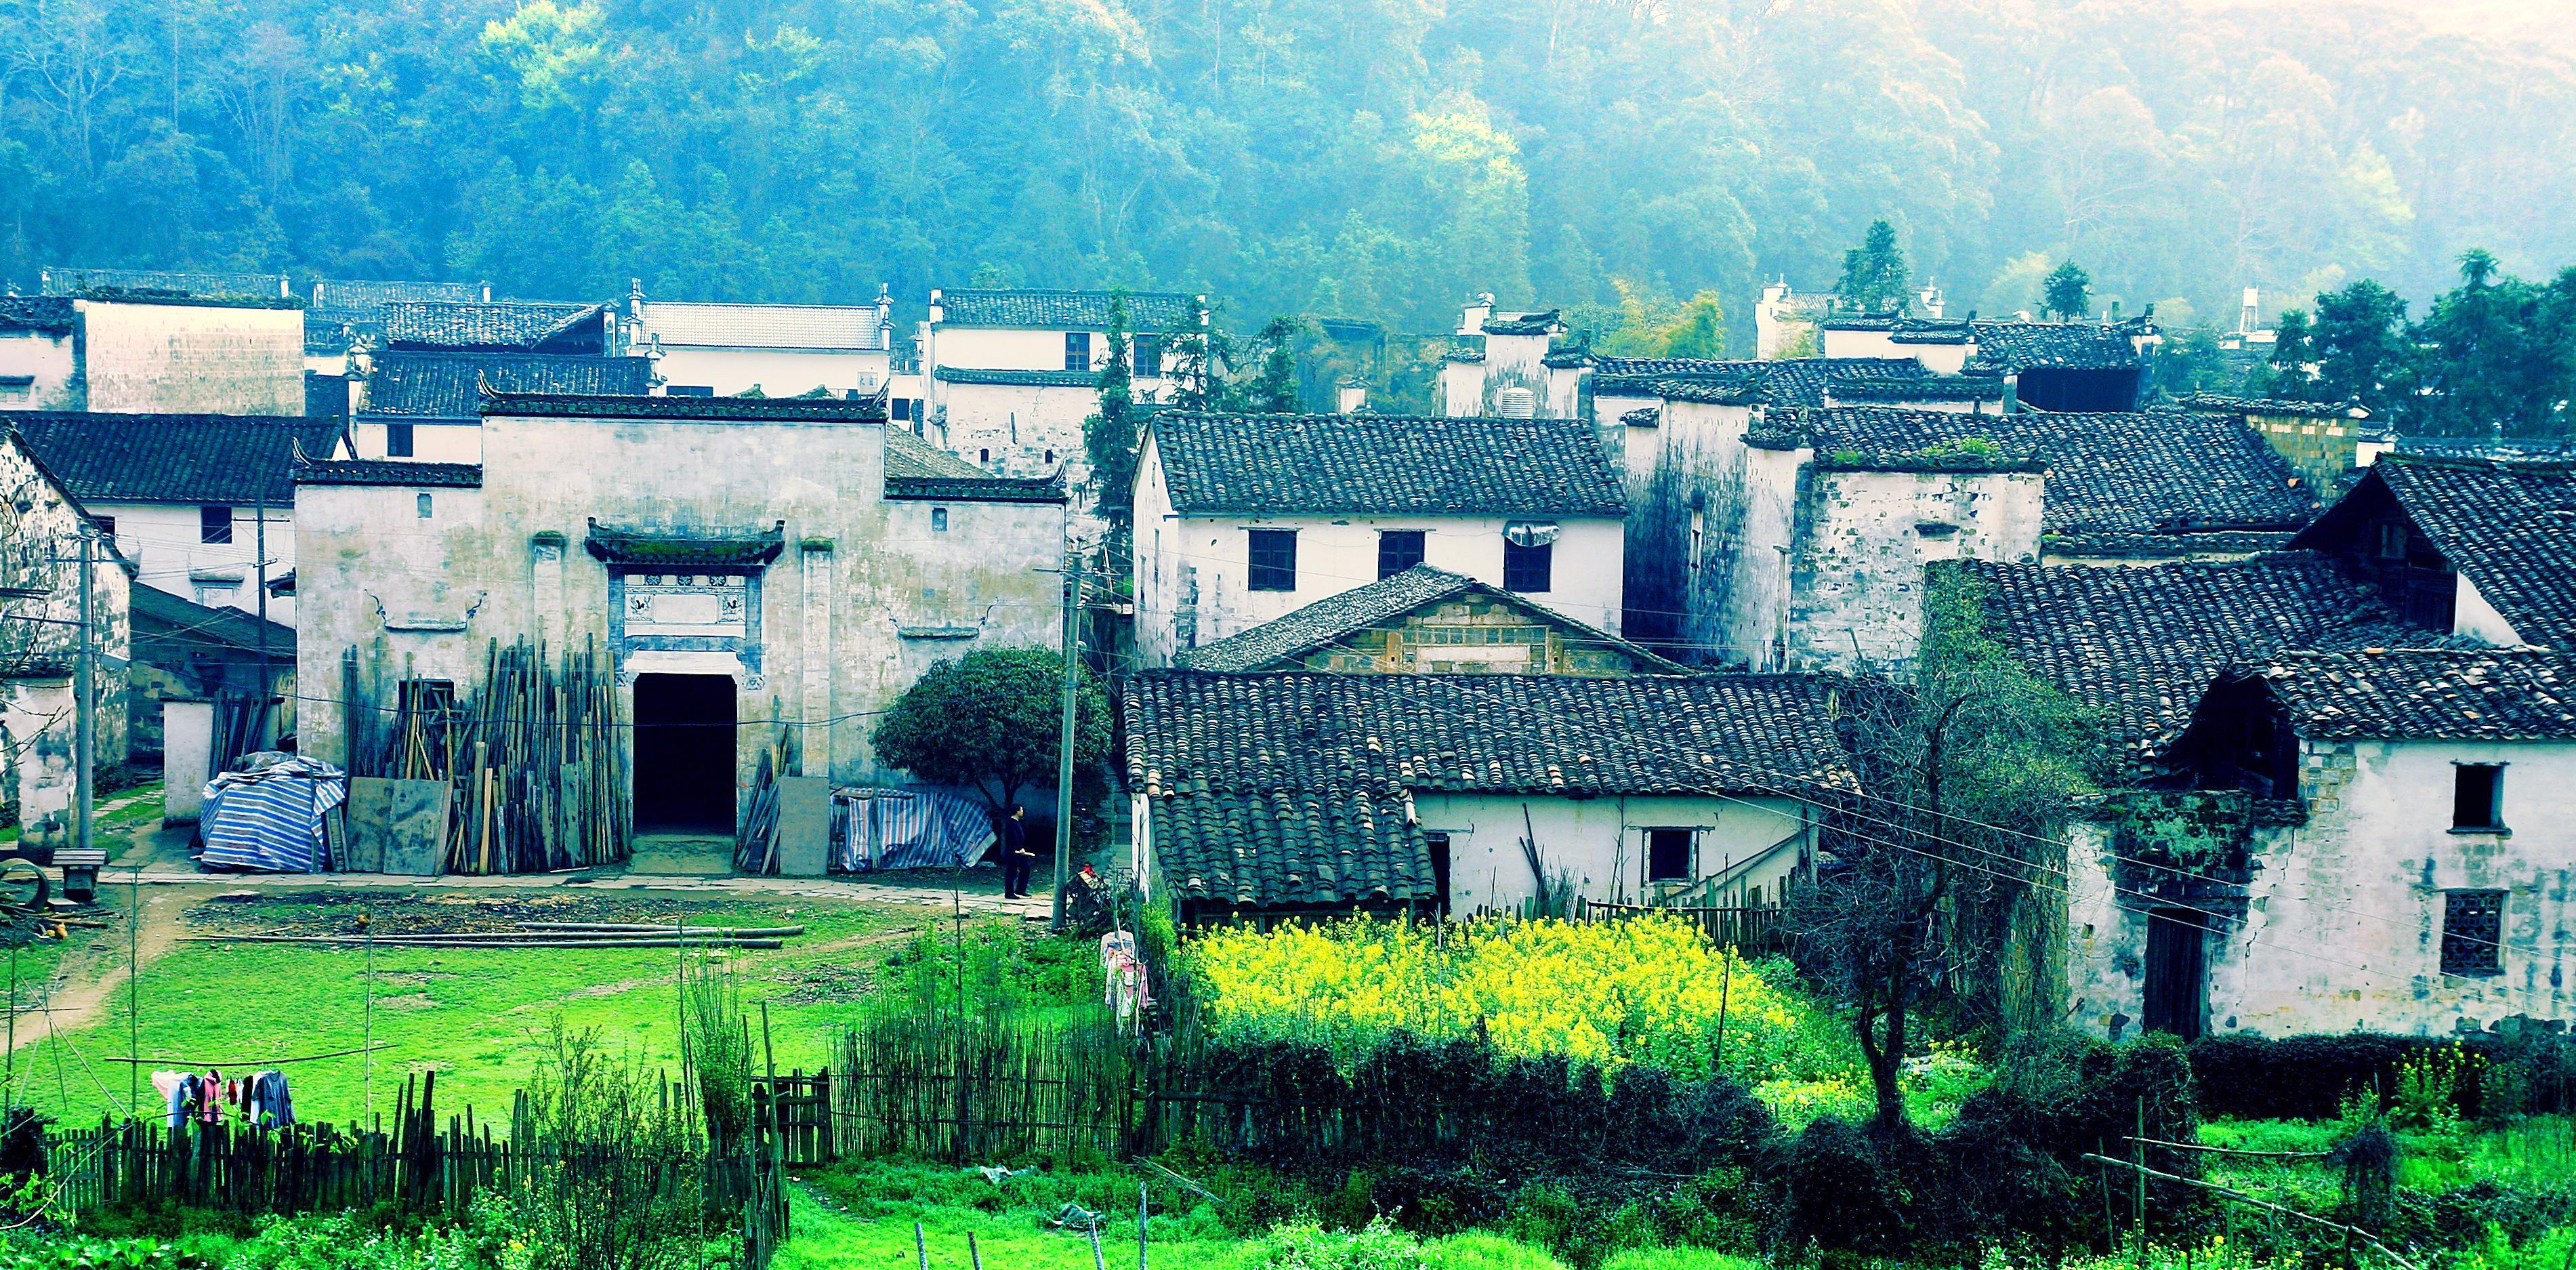 Sixi Village